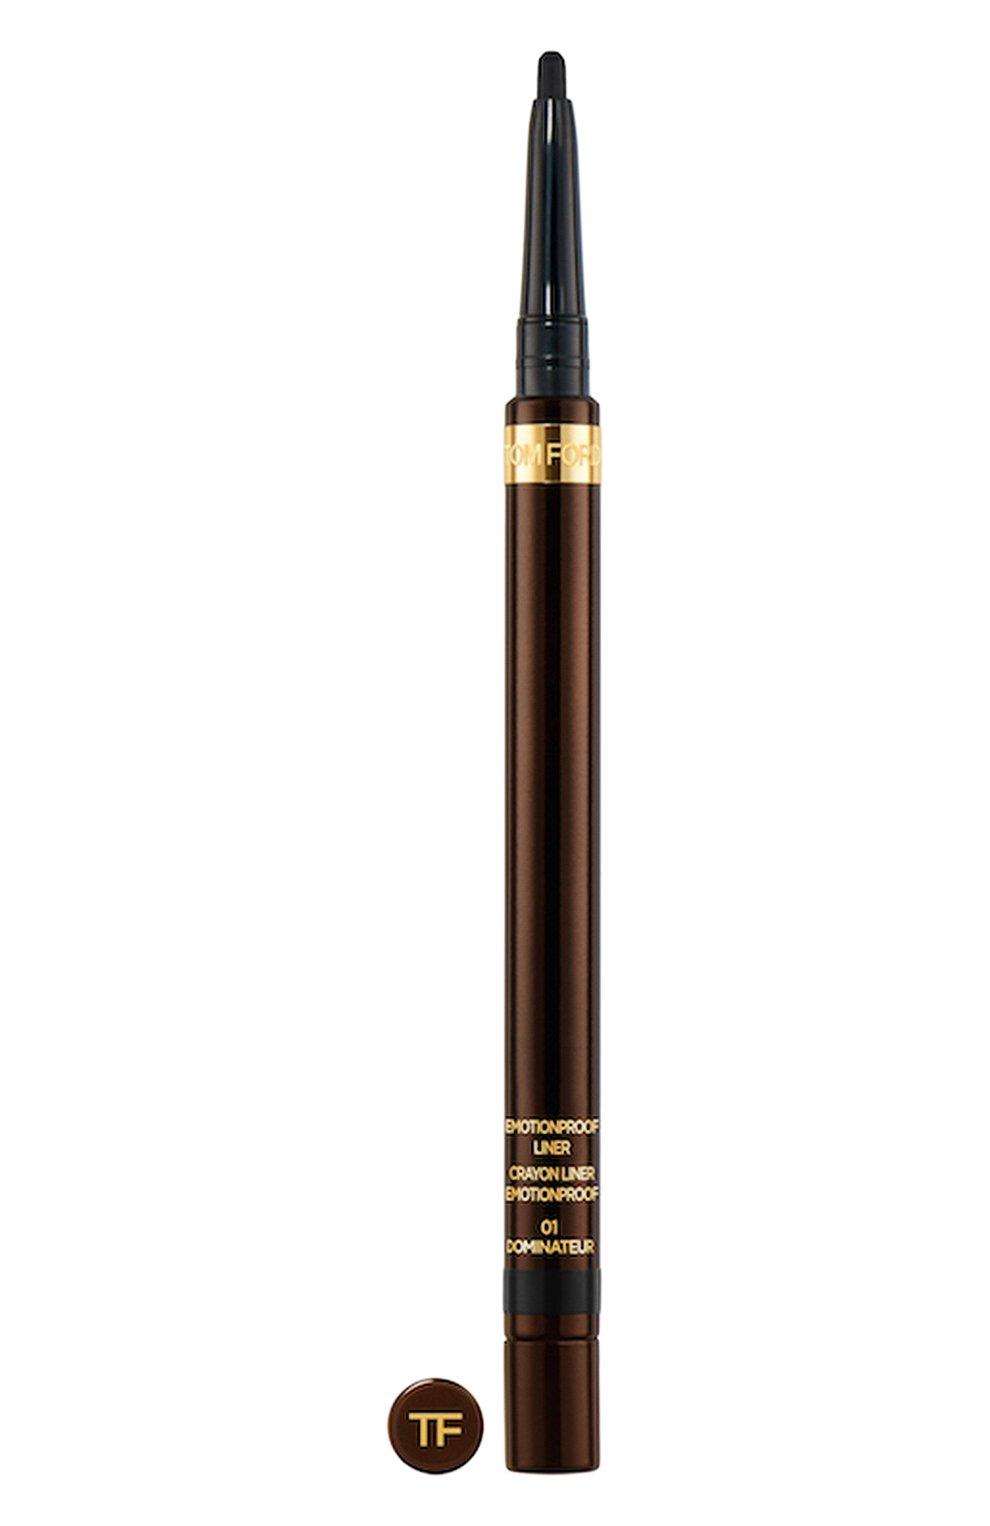 Женский карандаш для глаз emotionproof, оттенок 01 dominateur TOM FORD бесцветного цвета, арт. T6YF-01 | Фото 1